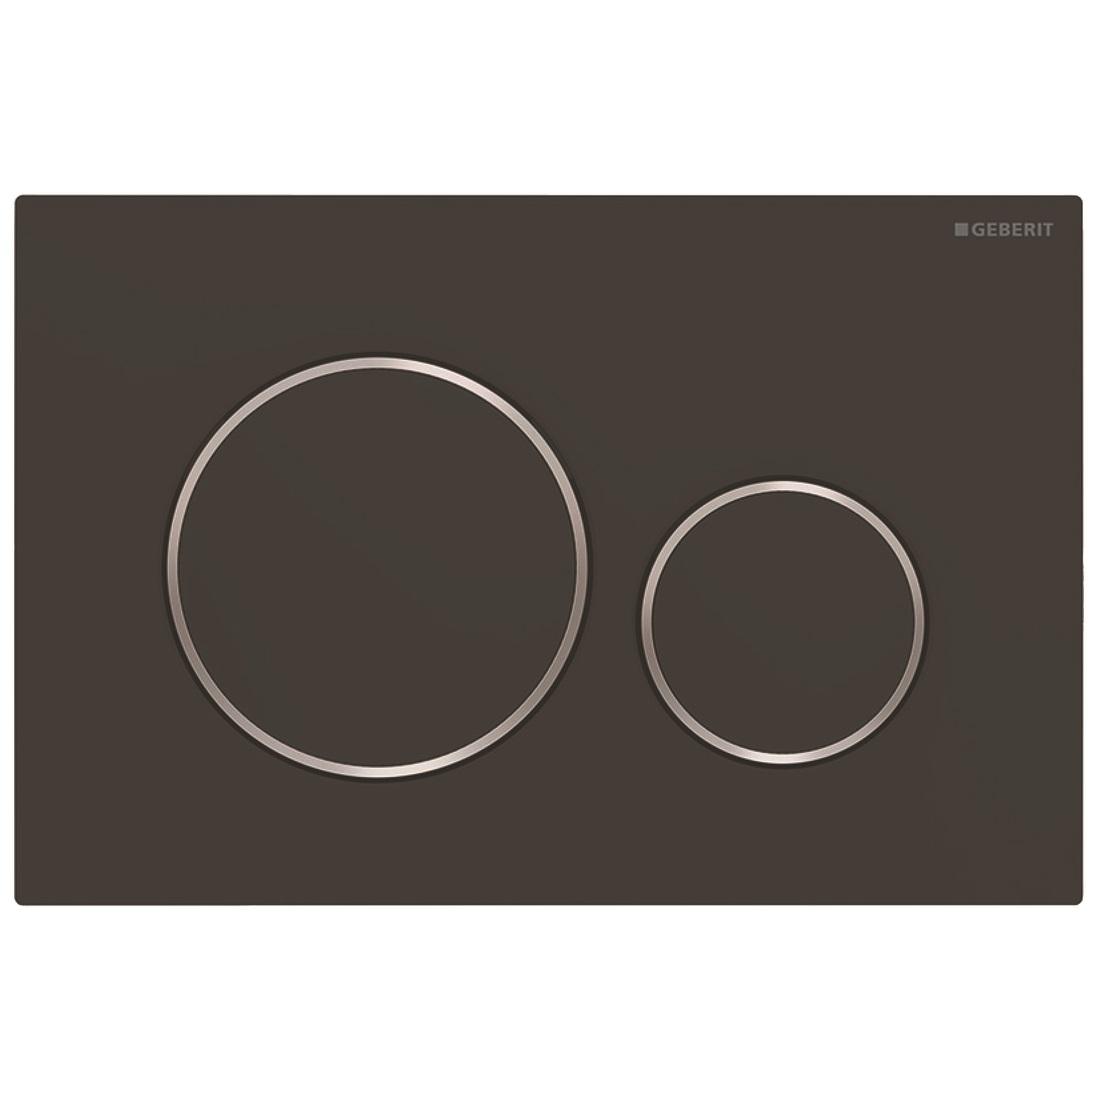 Clapeta actionare Geberit Sigma20 EasyToClean negru mat